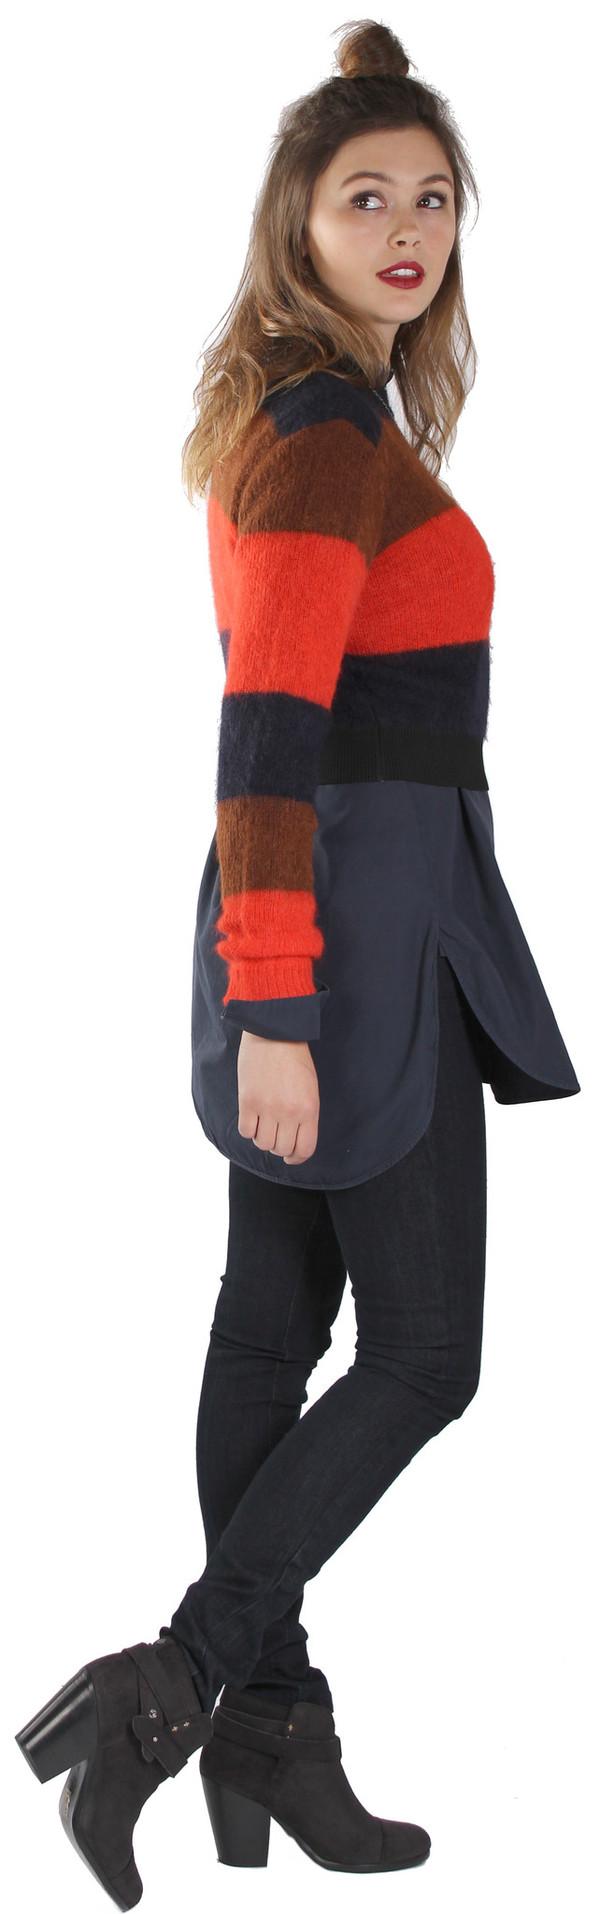 Rag & Bone Petra Pullover